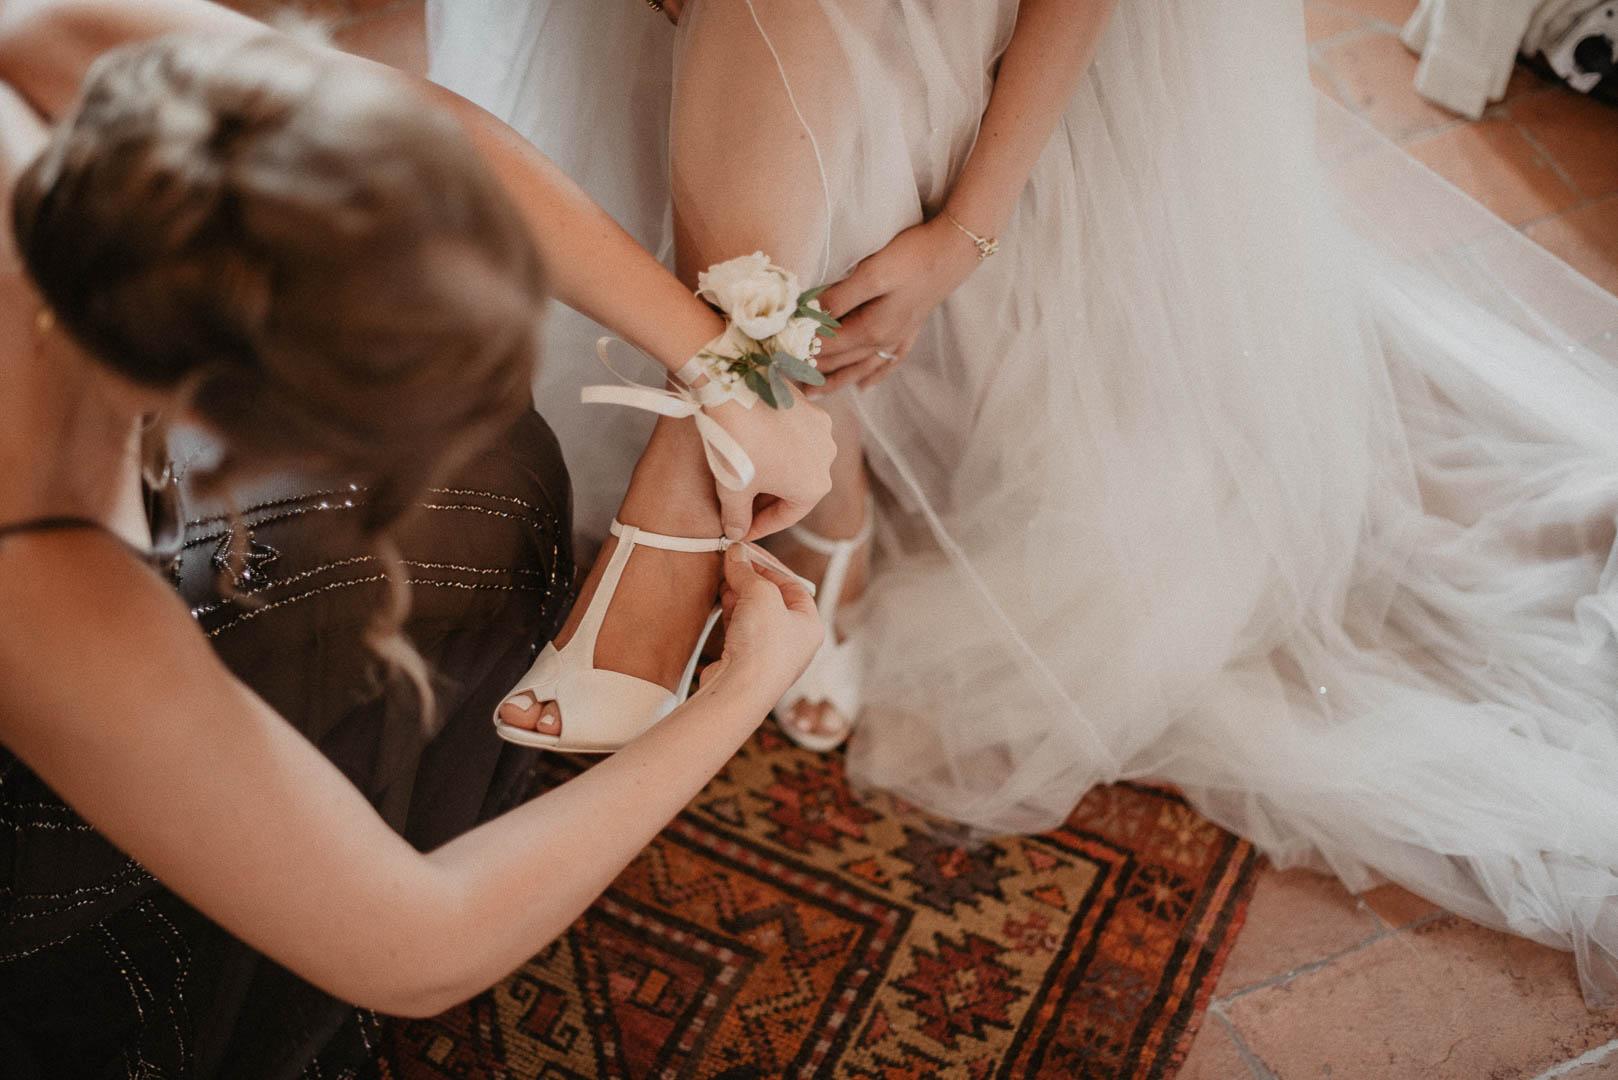 wedding-photographer-destination-fineart-bespoke-reportage-tuscany-villascorzi-vivianeizzo-spazio46-58